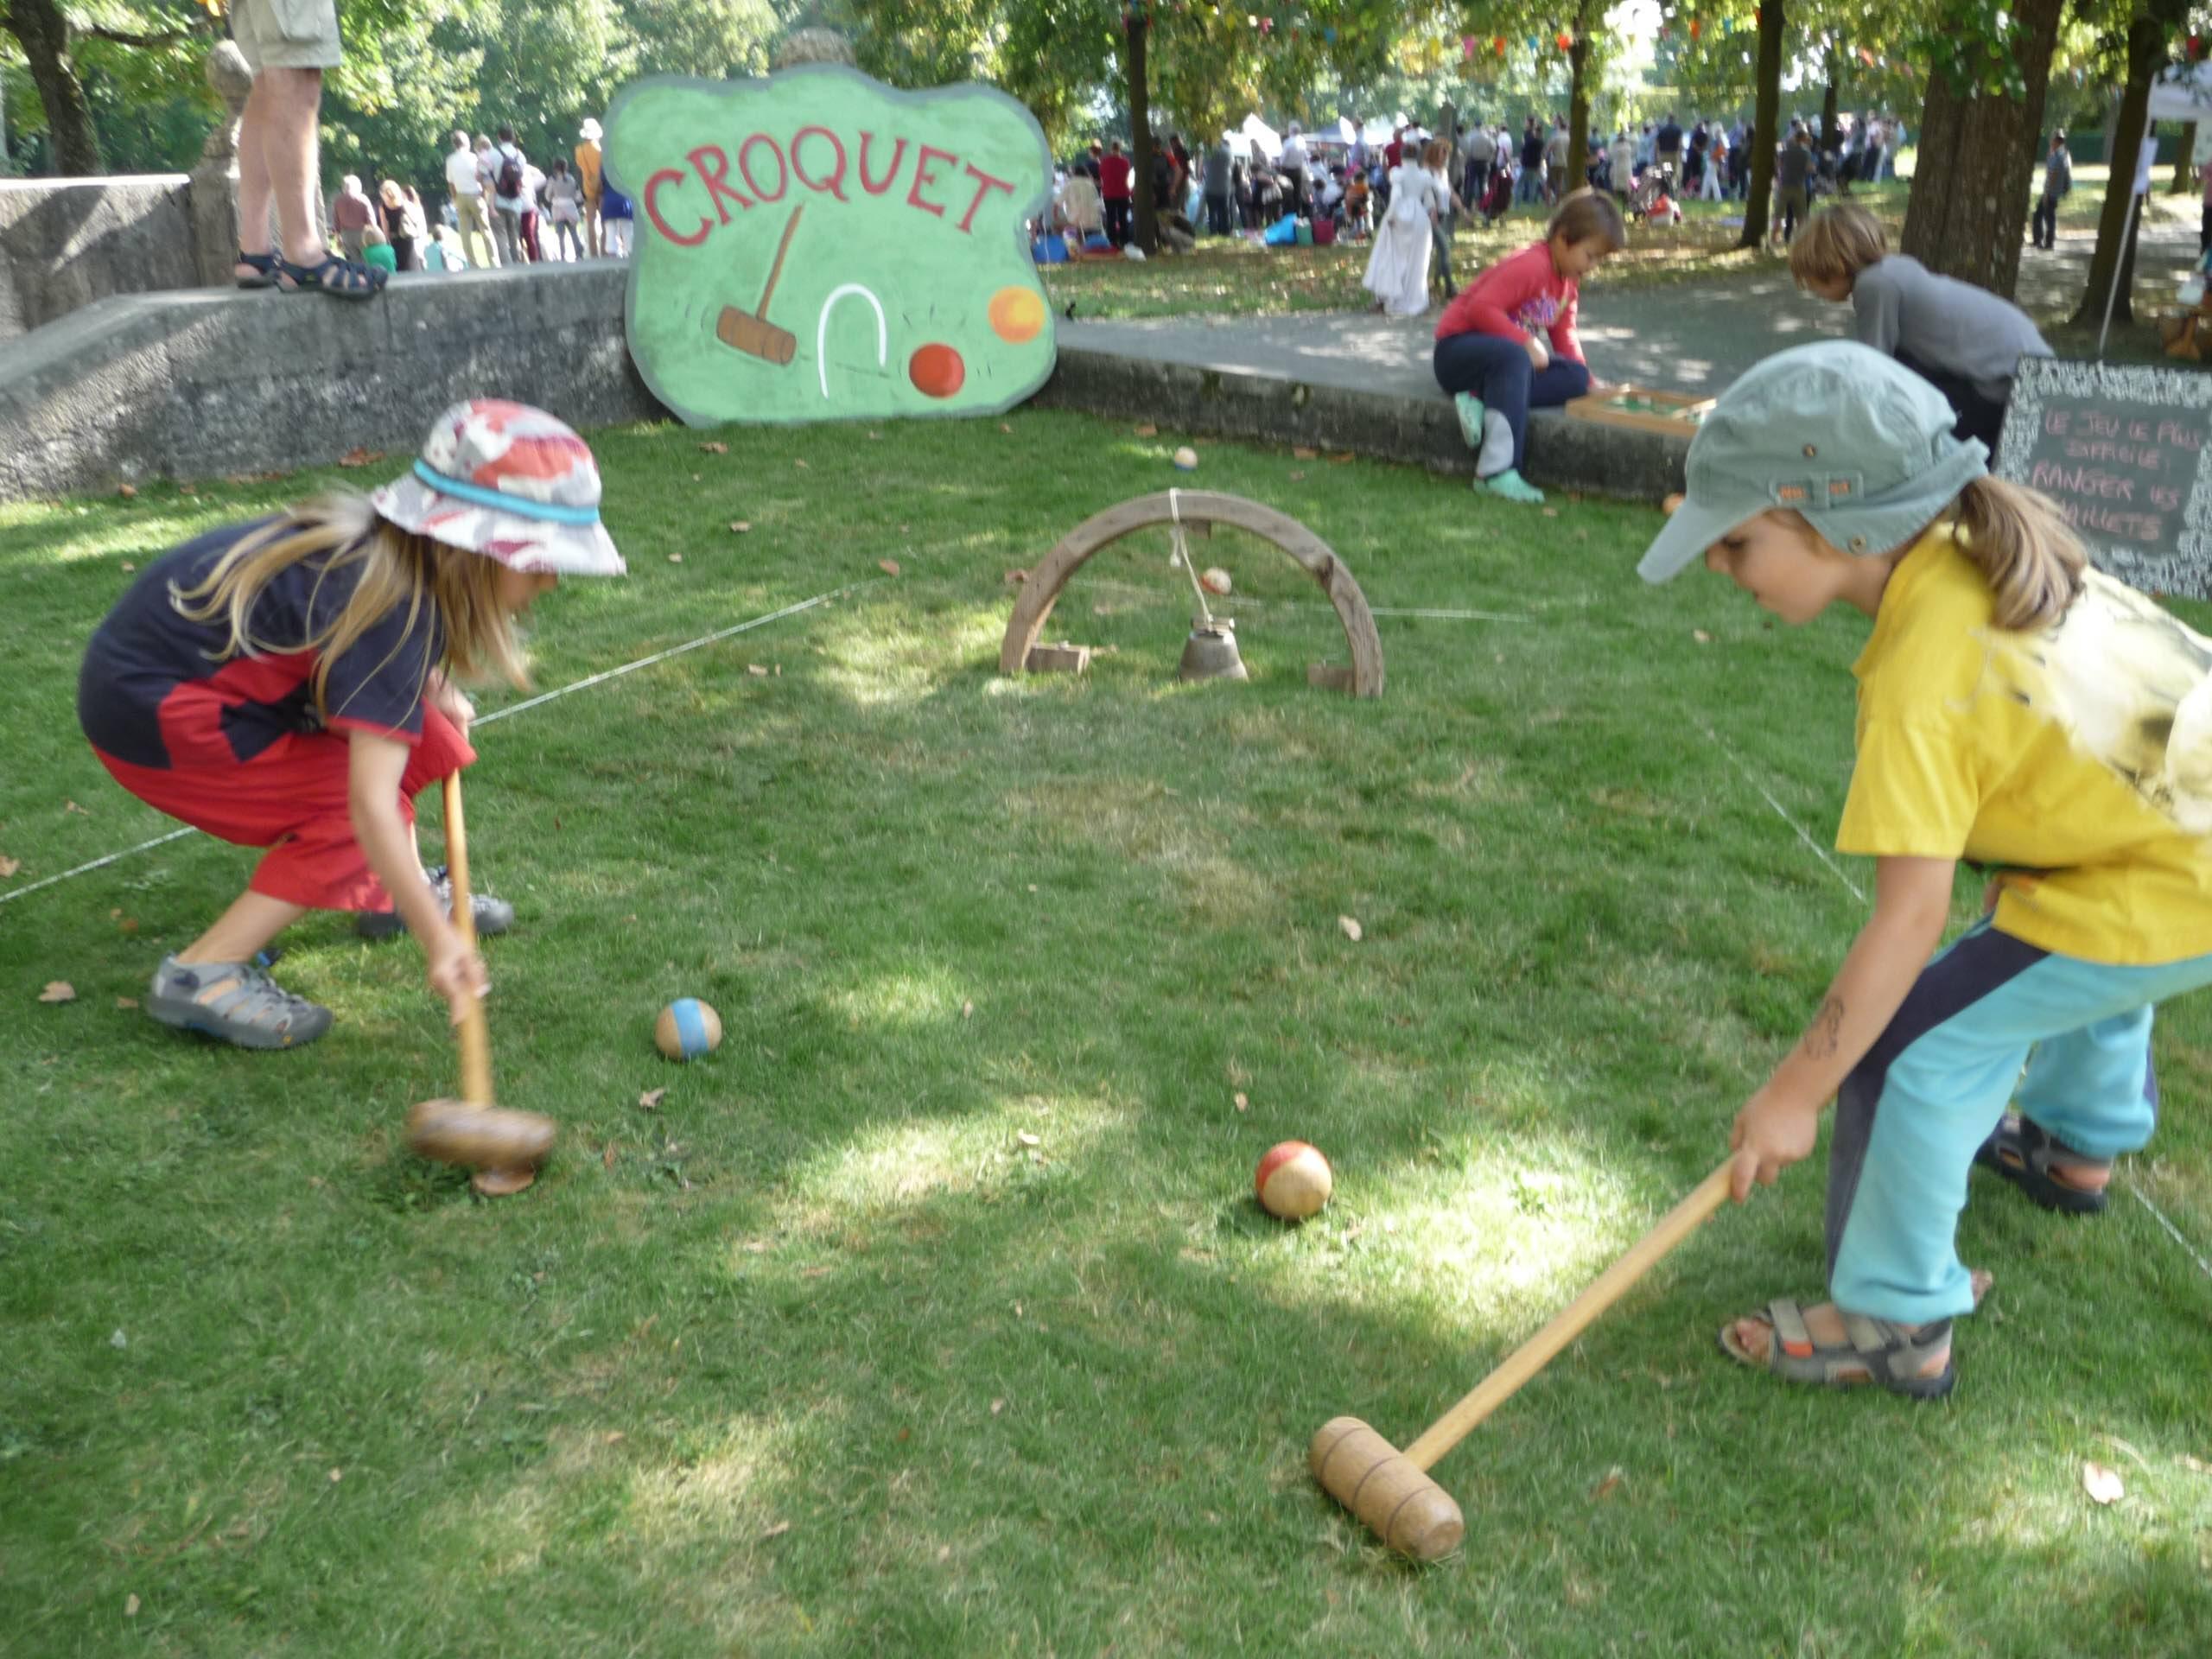 2014-09 Prangins croquet